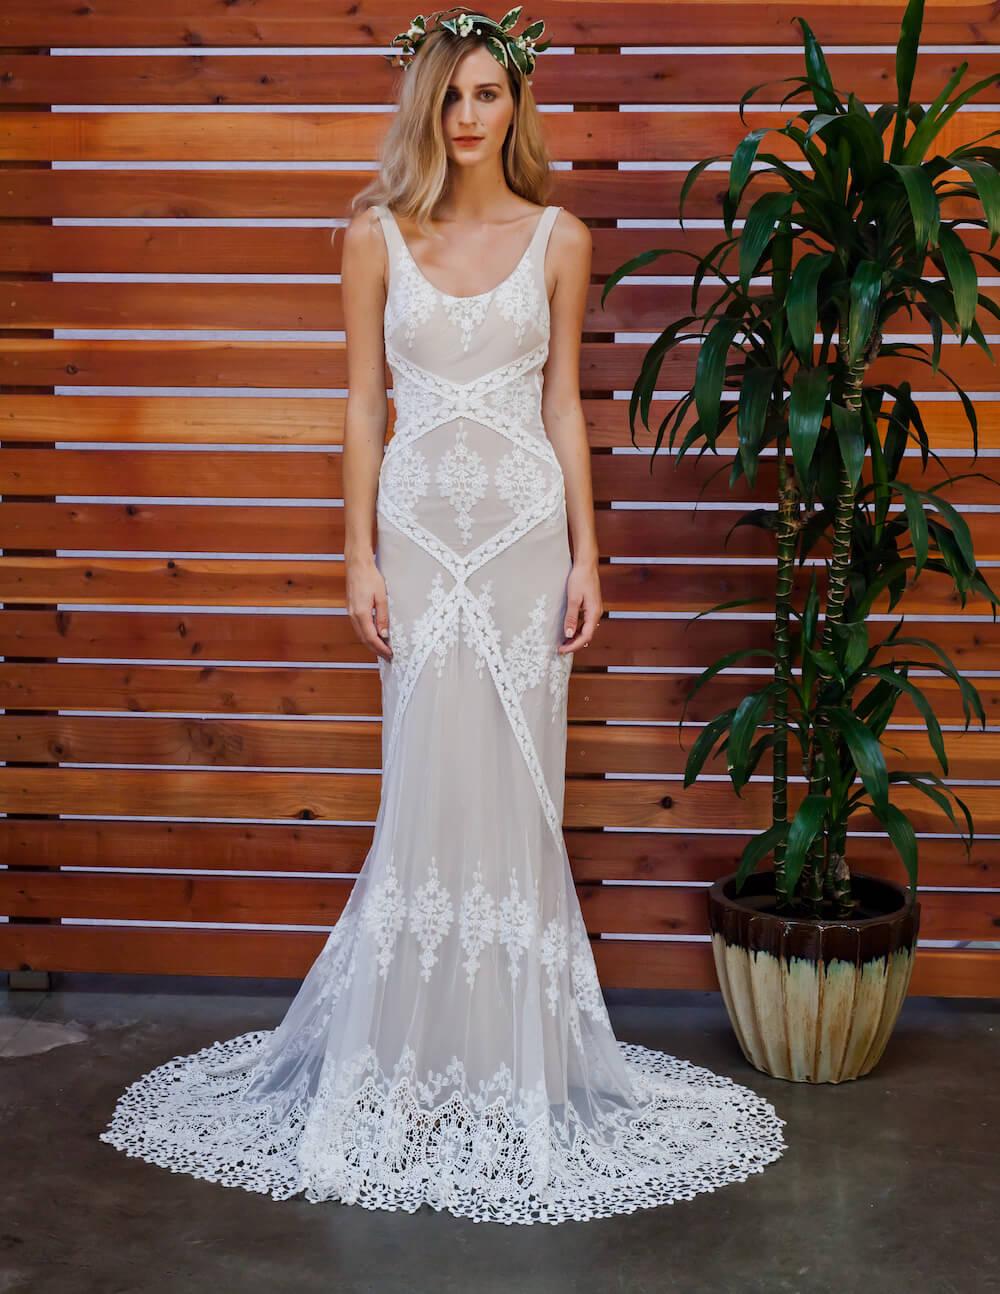 Dreamersandloversbohemianlaceweddingdresswith: Bridal Lace Wedding Dress At Reisefeber.org